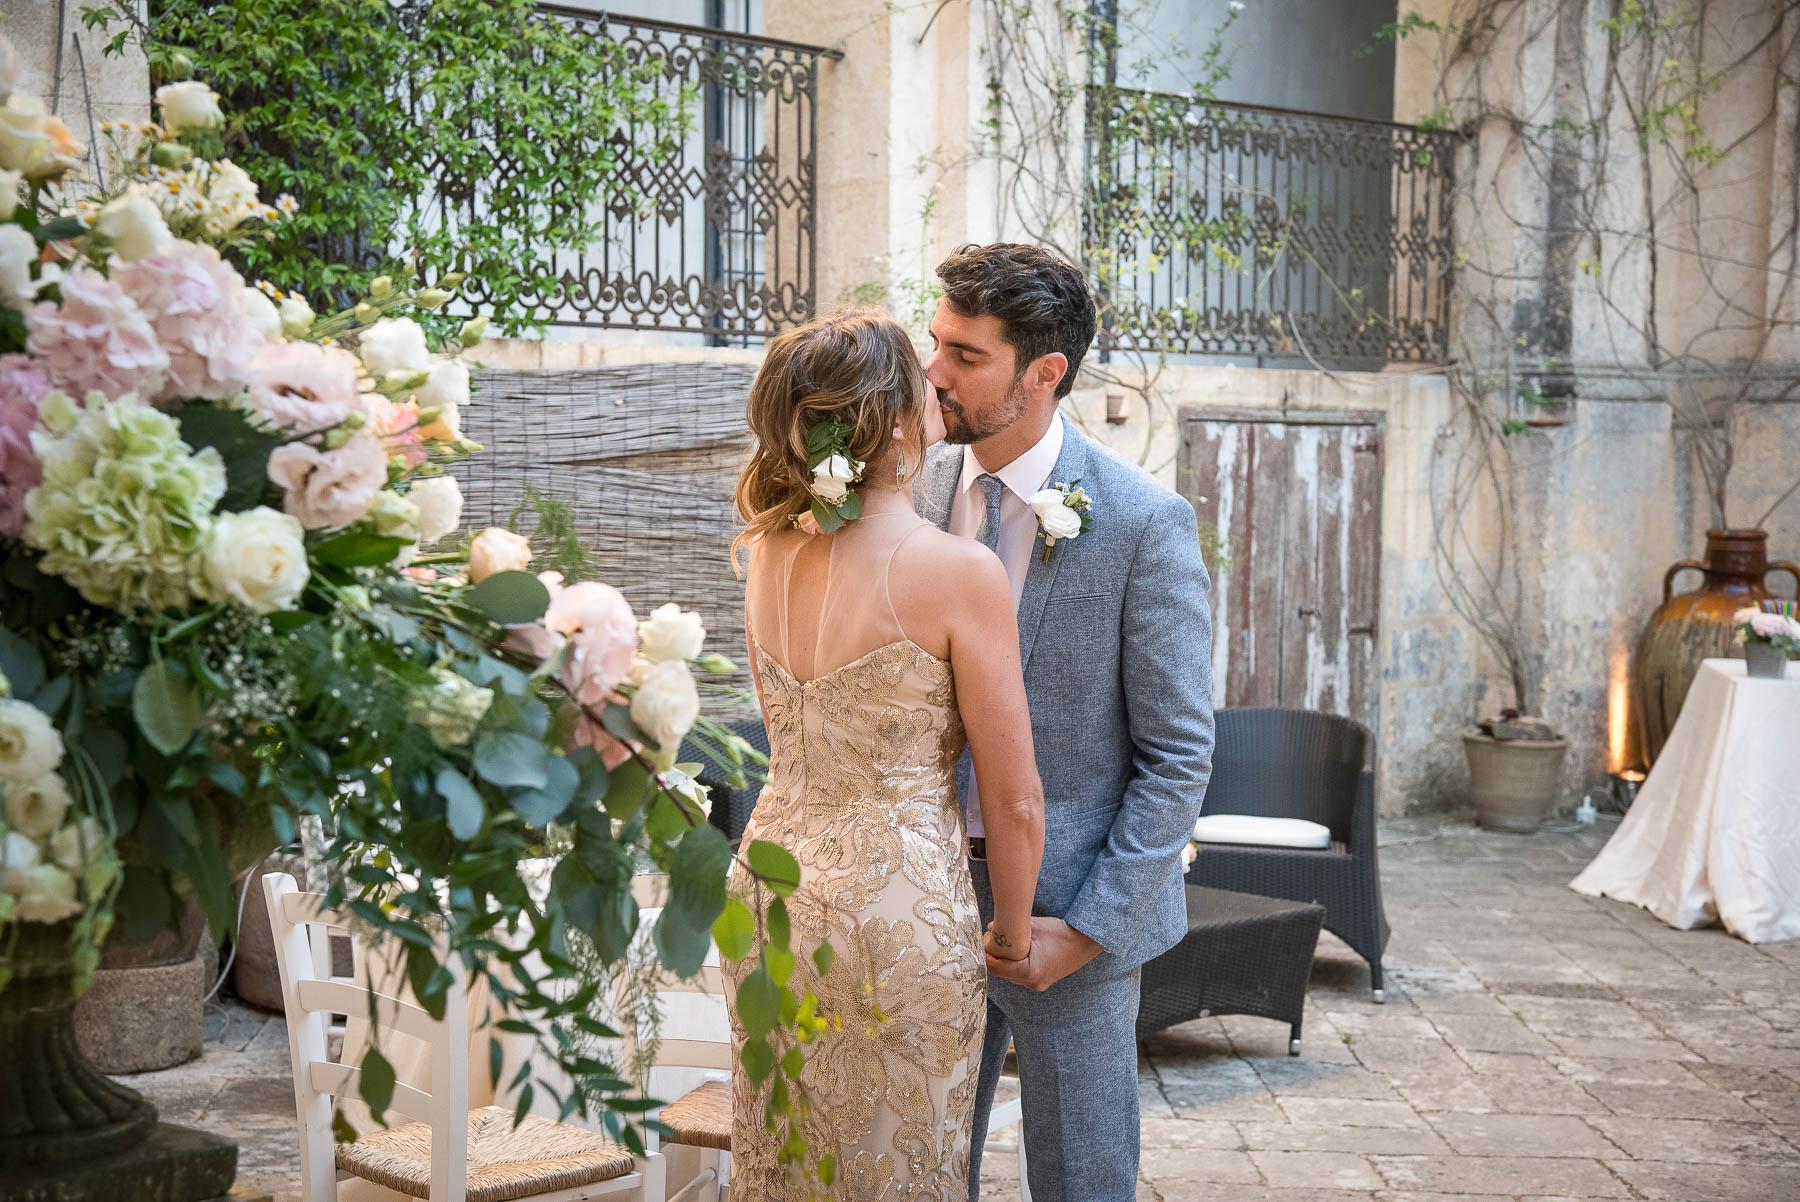 wedding palazzo daniele apulia 10.jpg